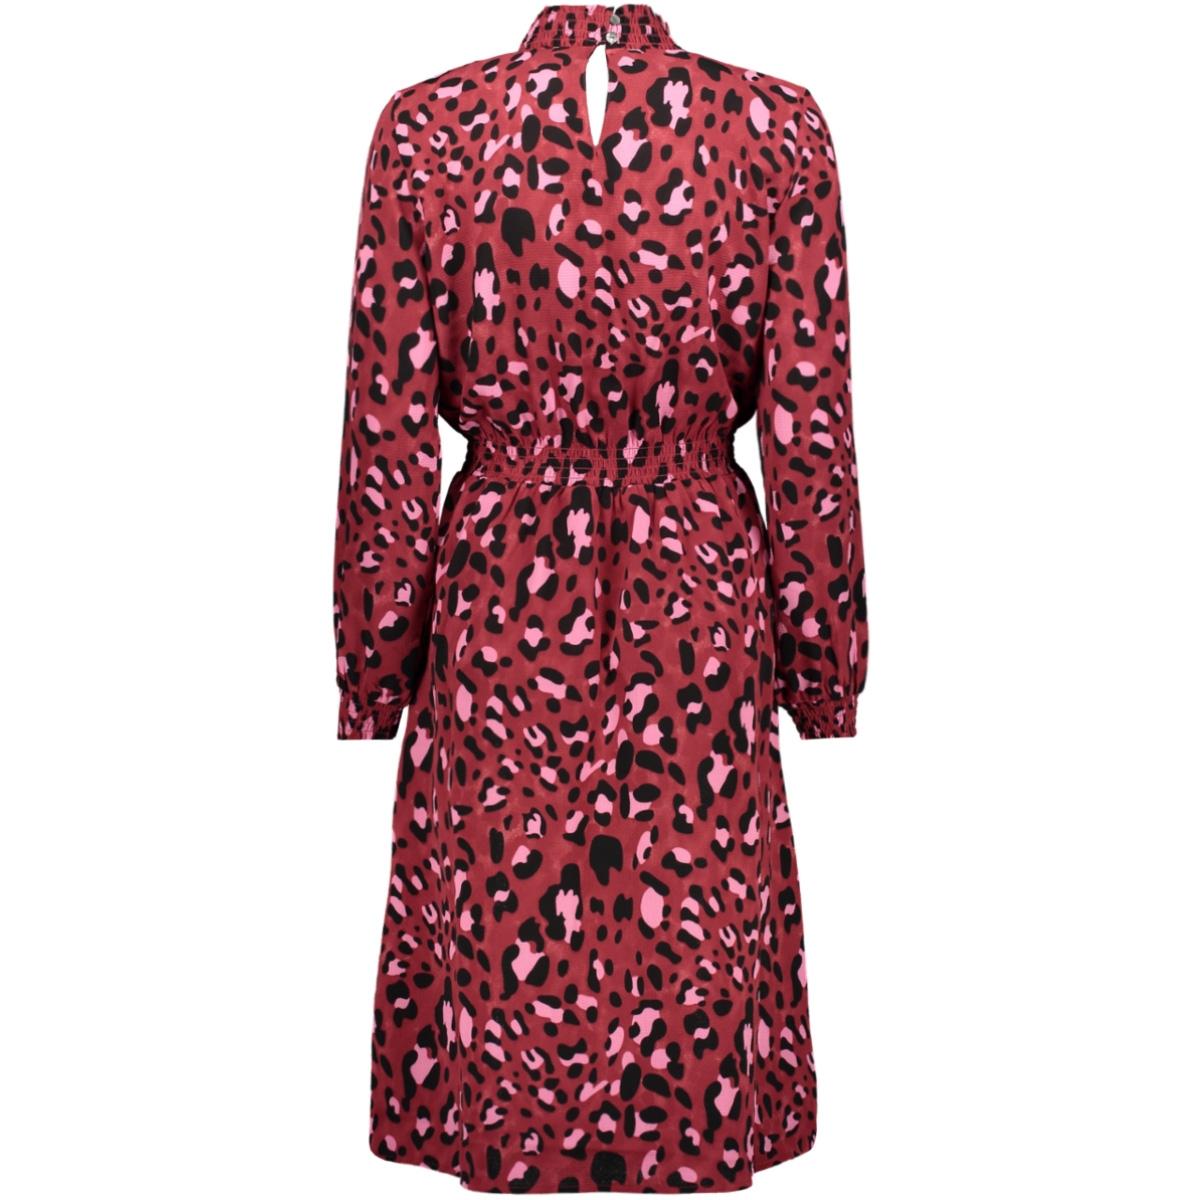 onlnova lux aop smock high dress 8 15198451 only jurk cordovan/bright leo